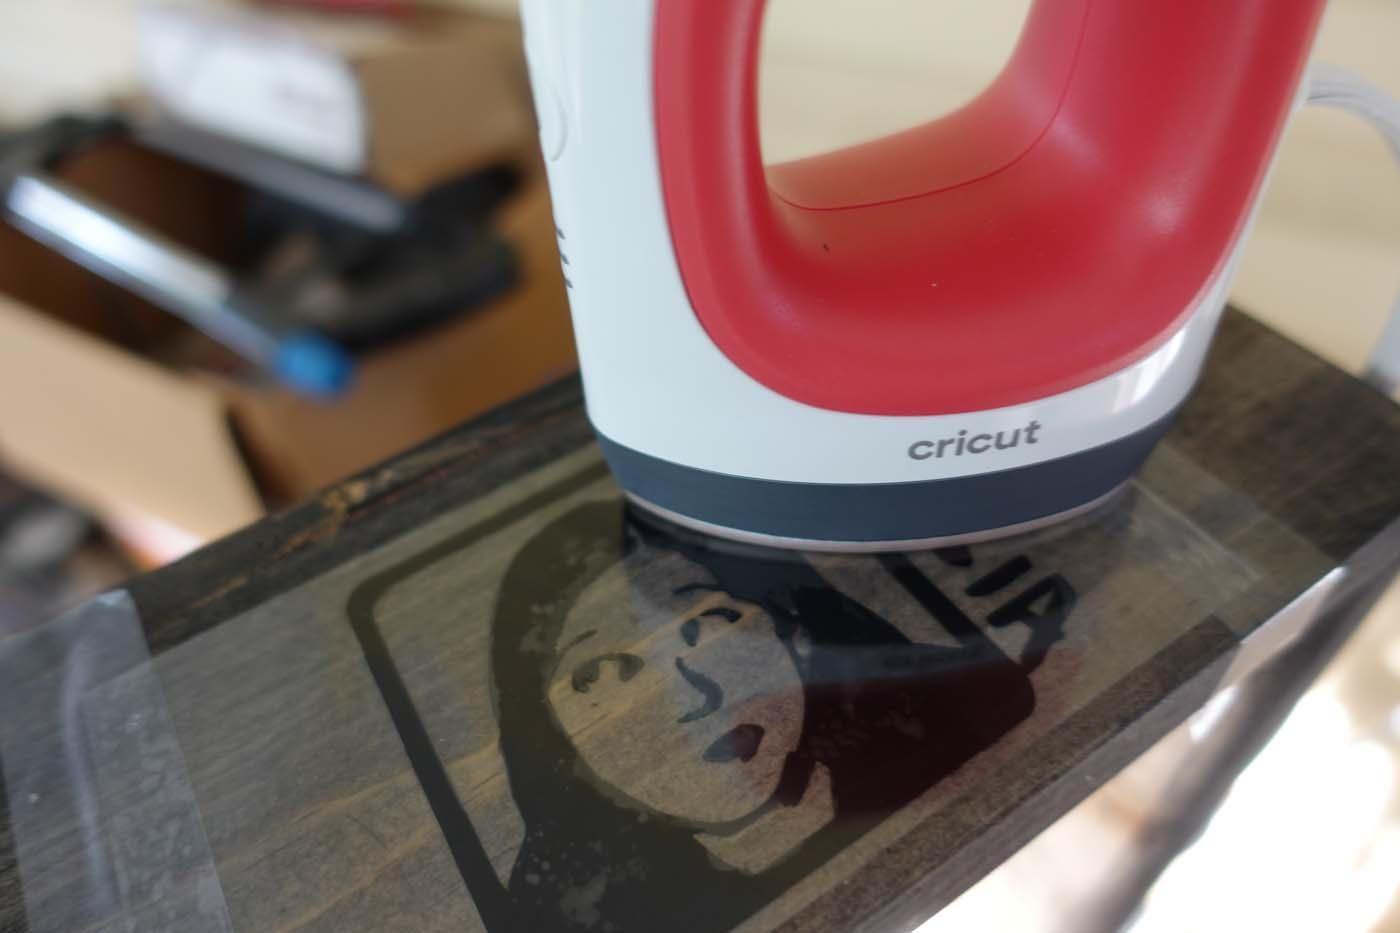 Using a Cricut EasyPress Mini for an iron-on vinyl design